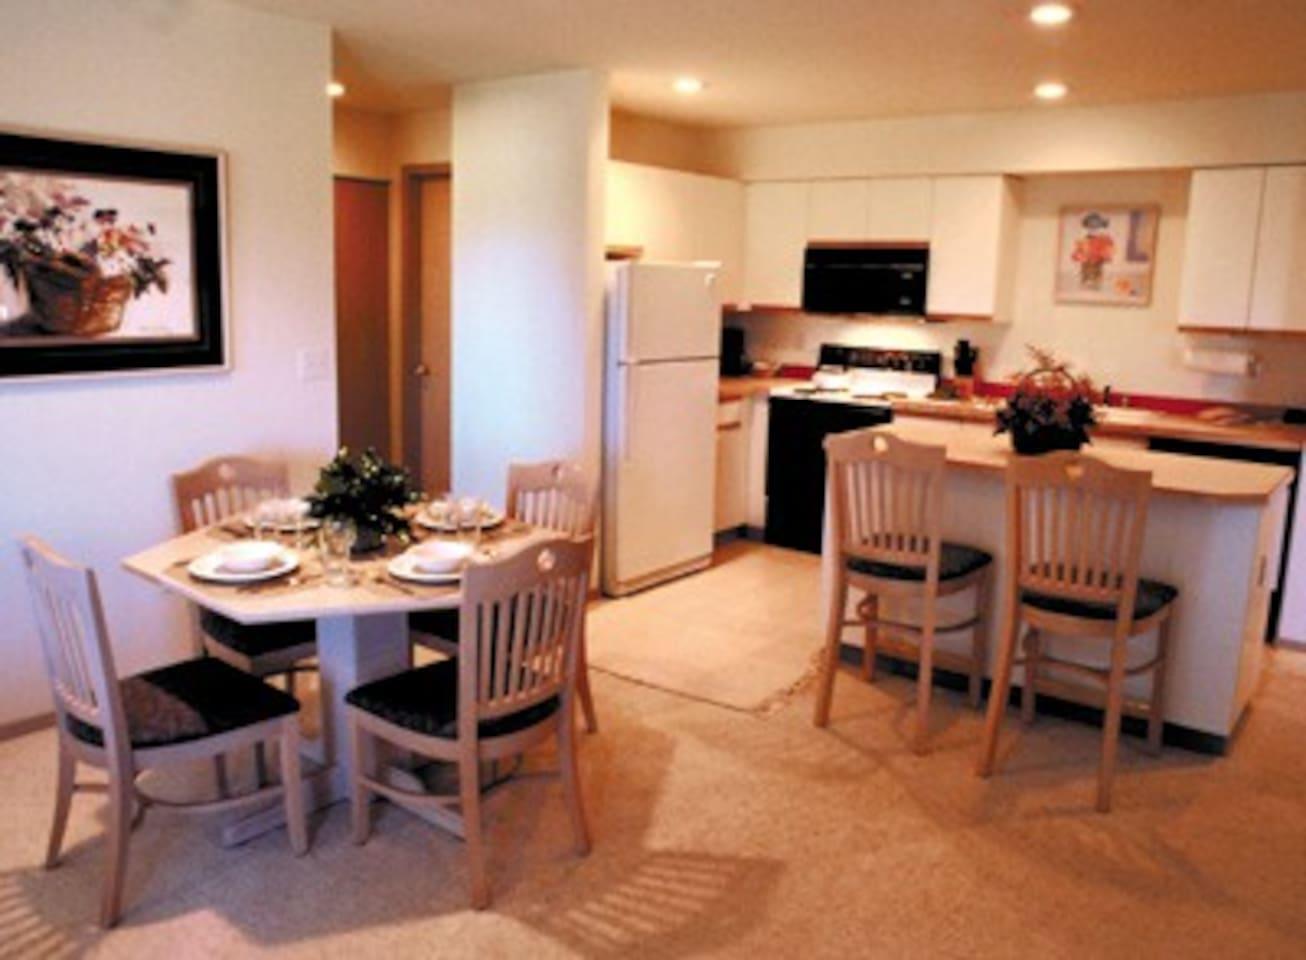 1-Bedroom Timeshare in Birch Bay WA